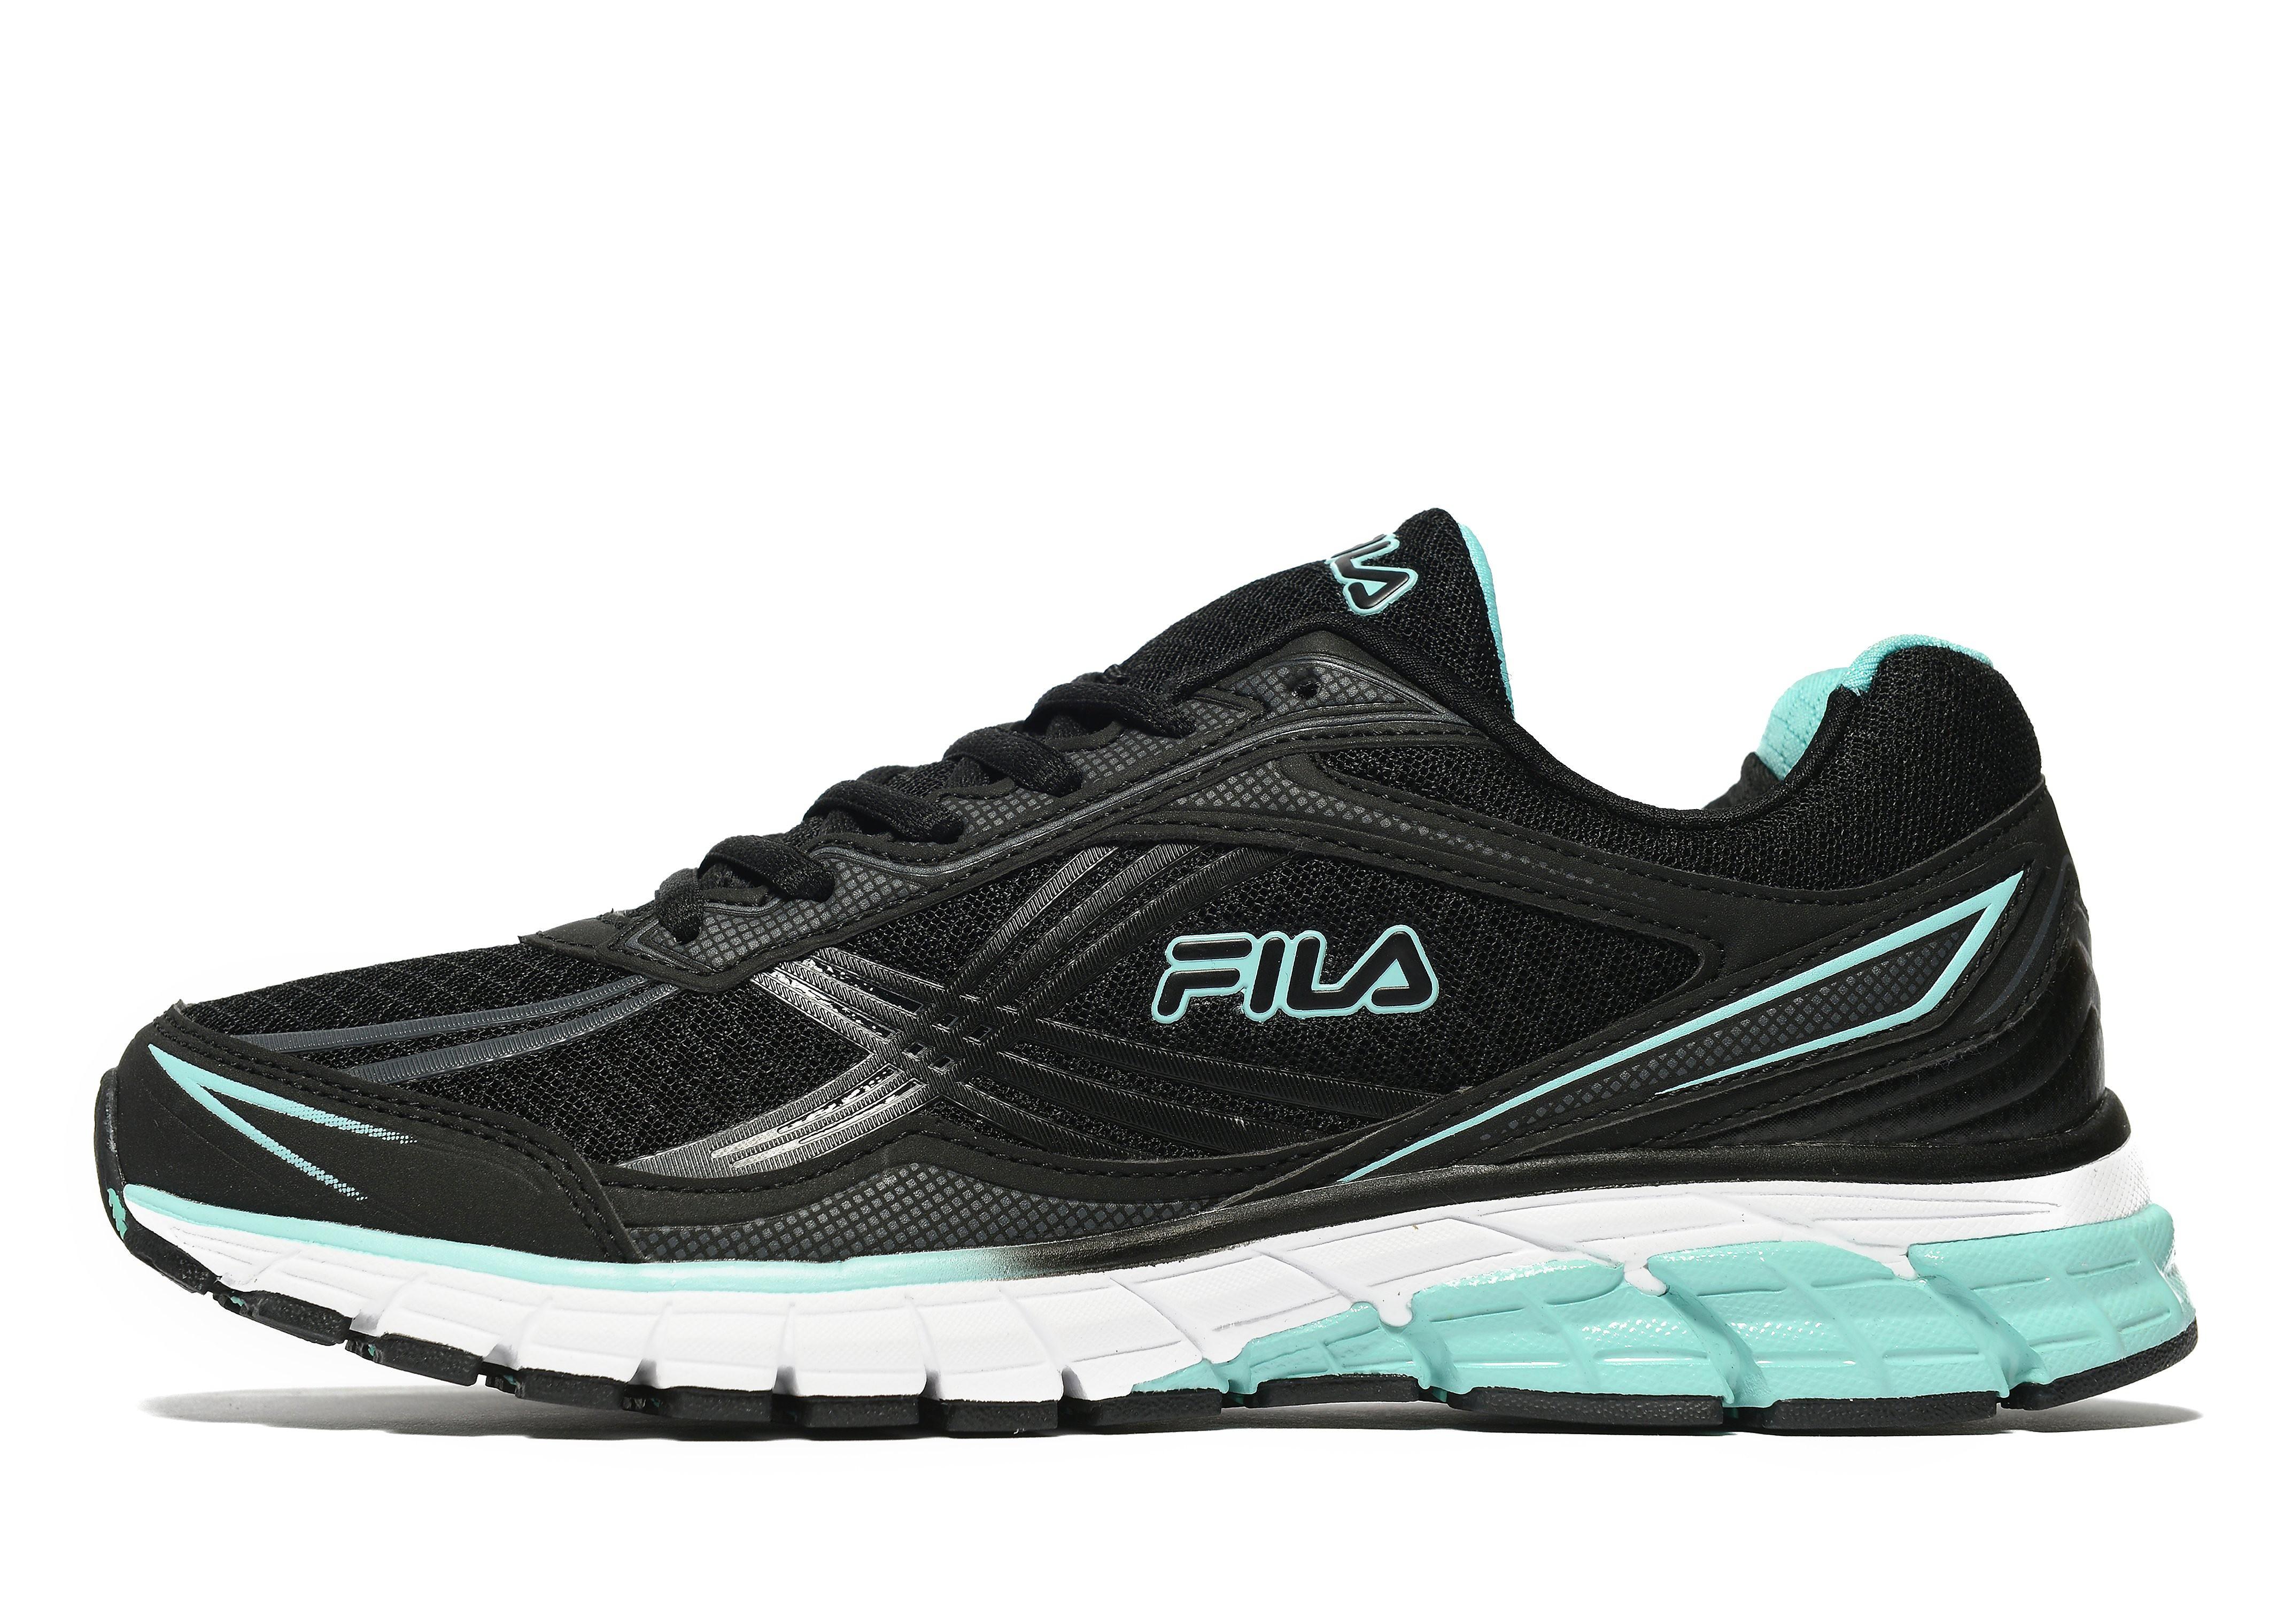 Fila Nitro Fuel 4 für Damen